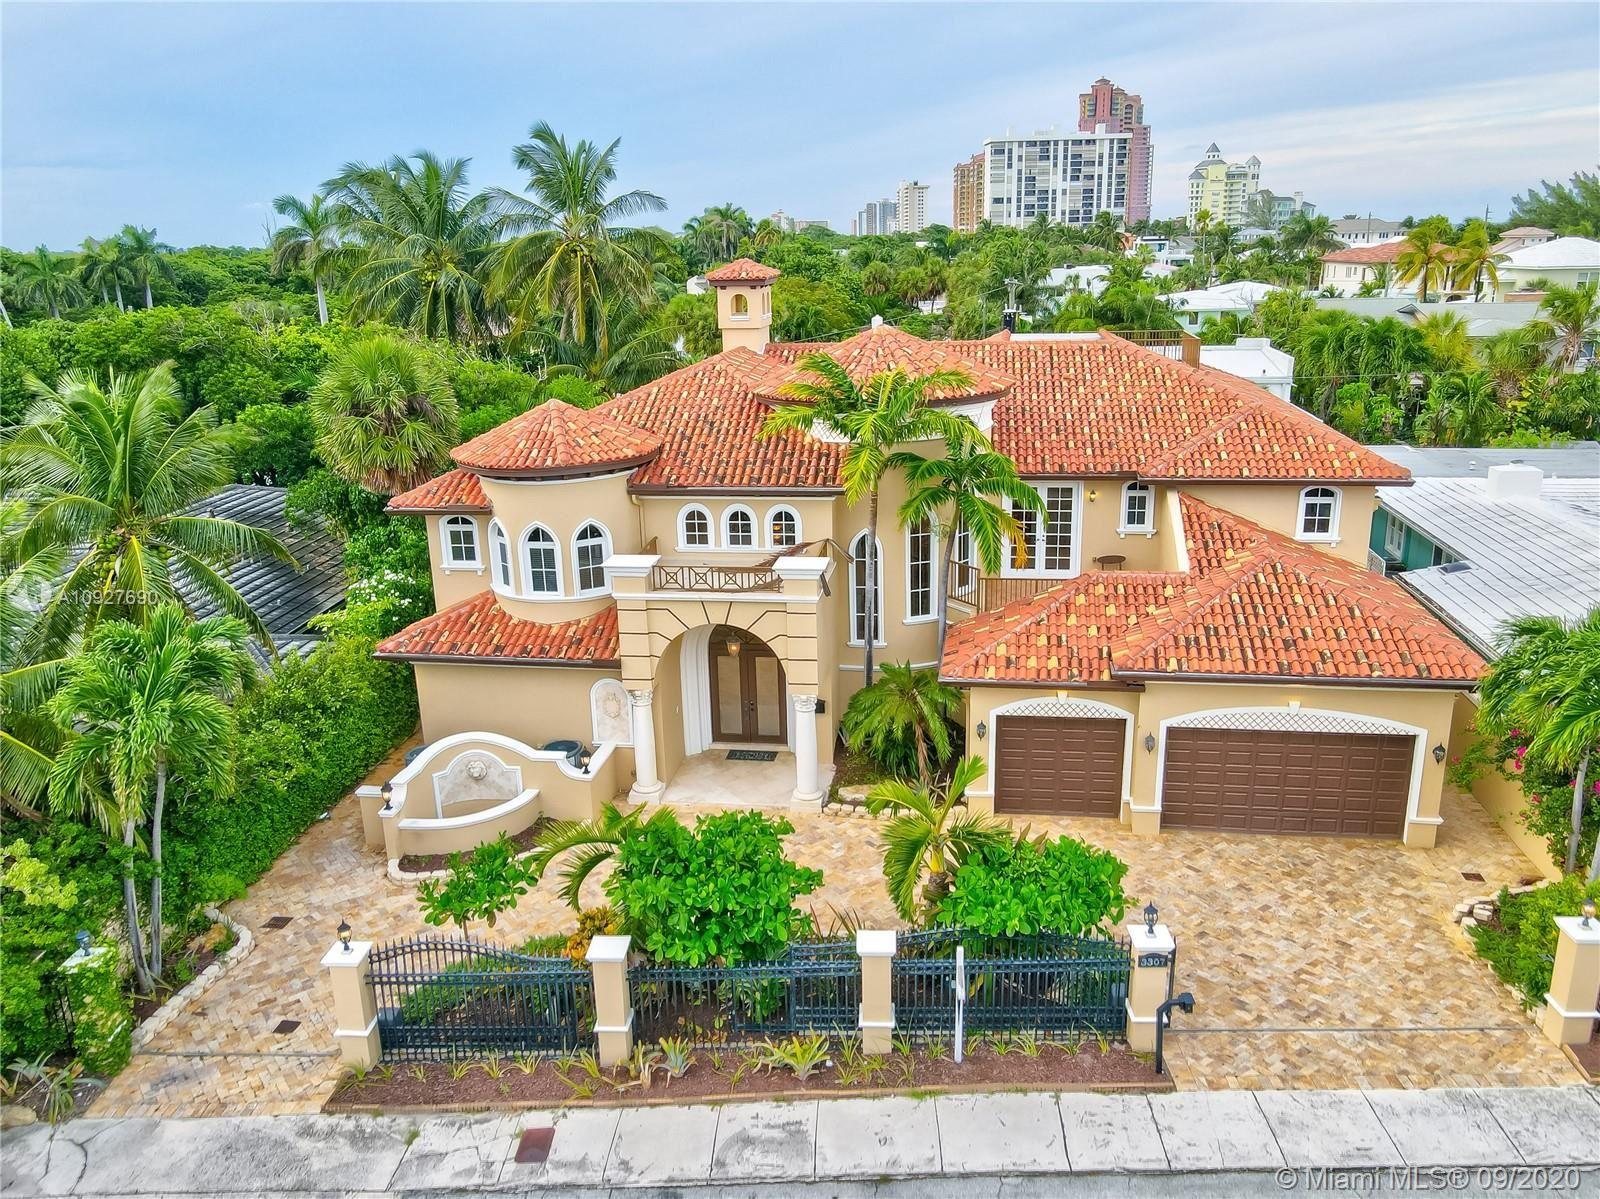 Photo of 3307 NE 16th St, Fort Lauderdale, FL 33304 (MLS # A10927690)